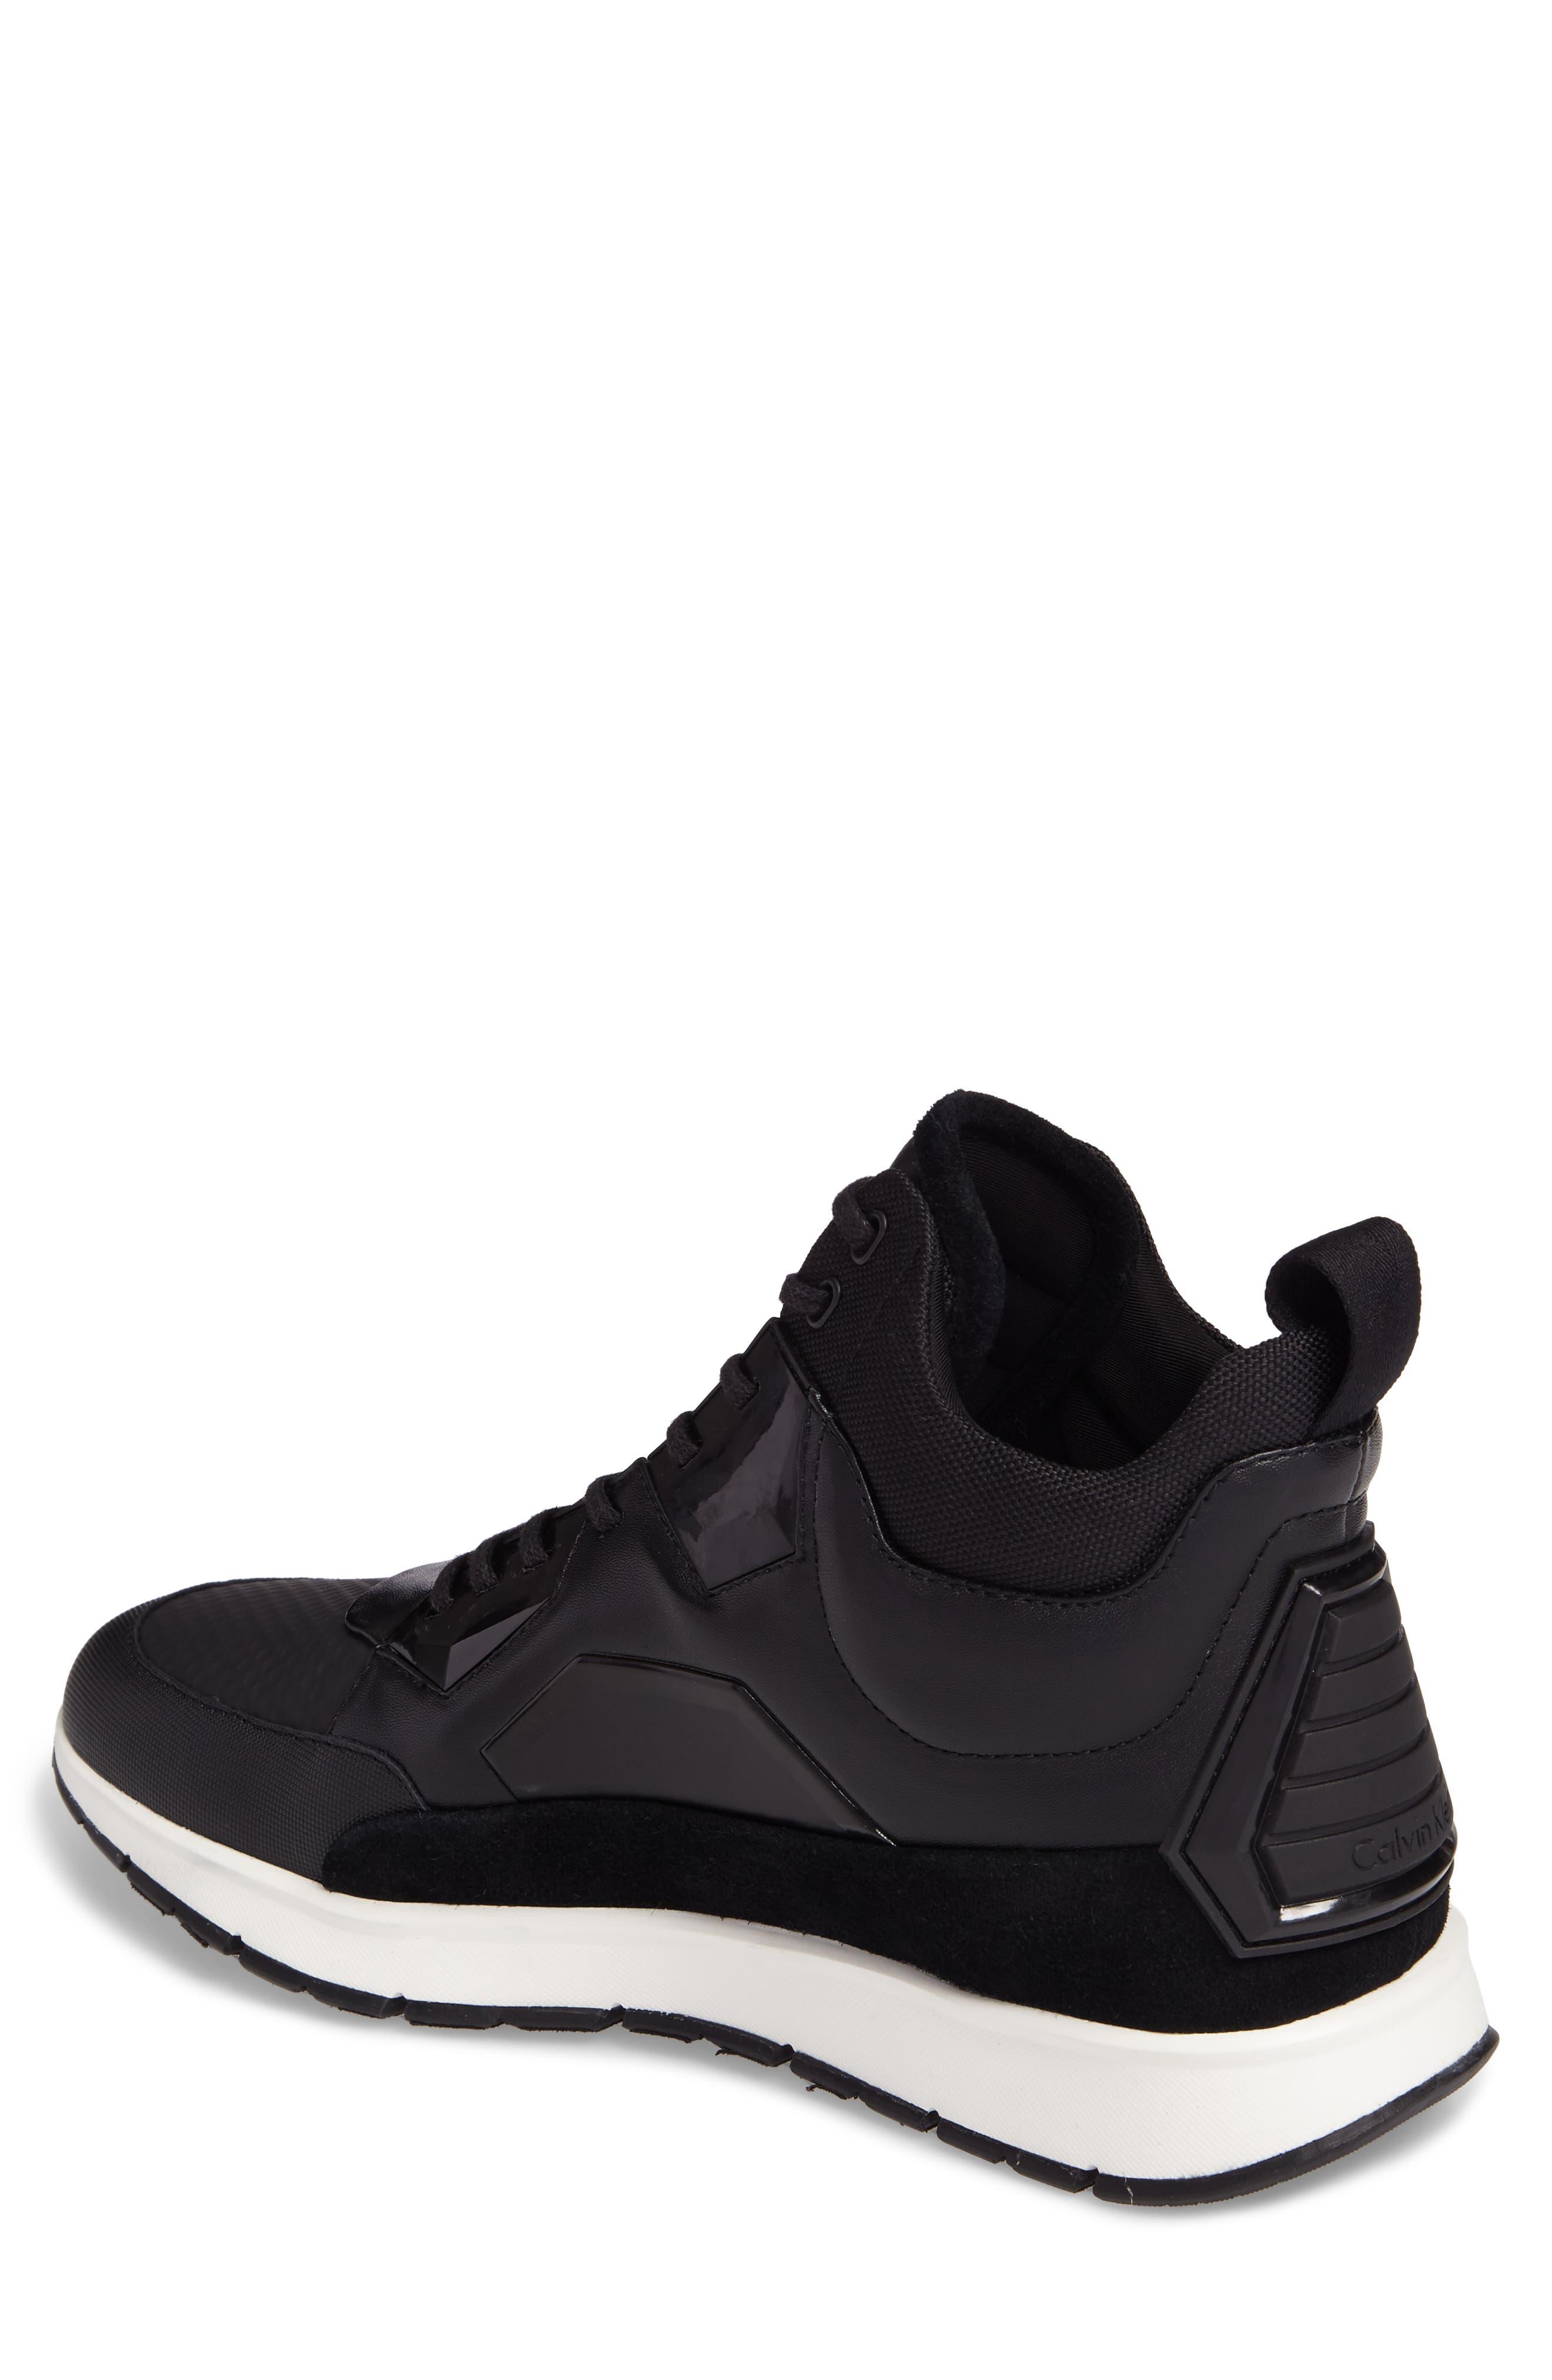 Alternate Image 2  - Calvin Klein Kovan City Sneaker (Men)